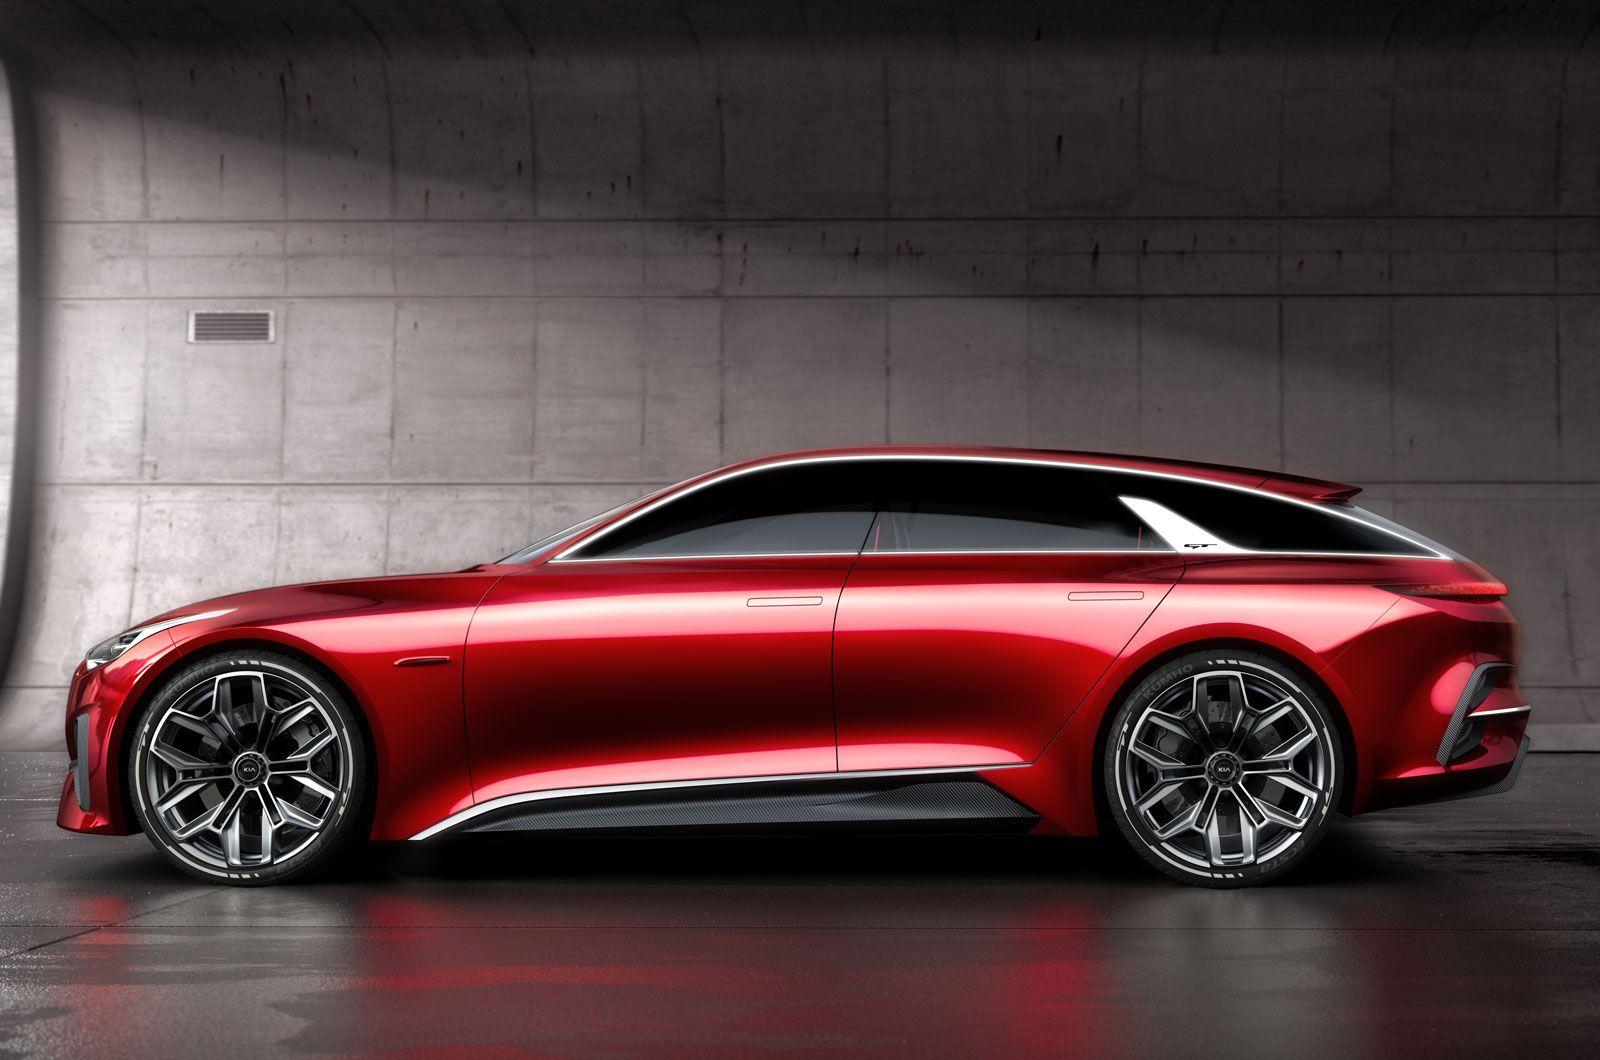 Kia Proceed Shooting Brake Concept On Show At Frankfurt Motor Show 멋진 자동차 자동차